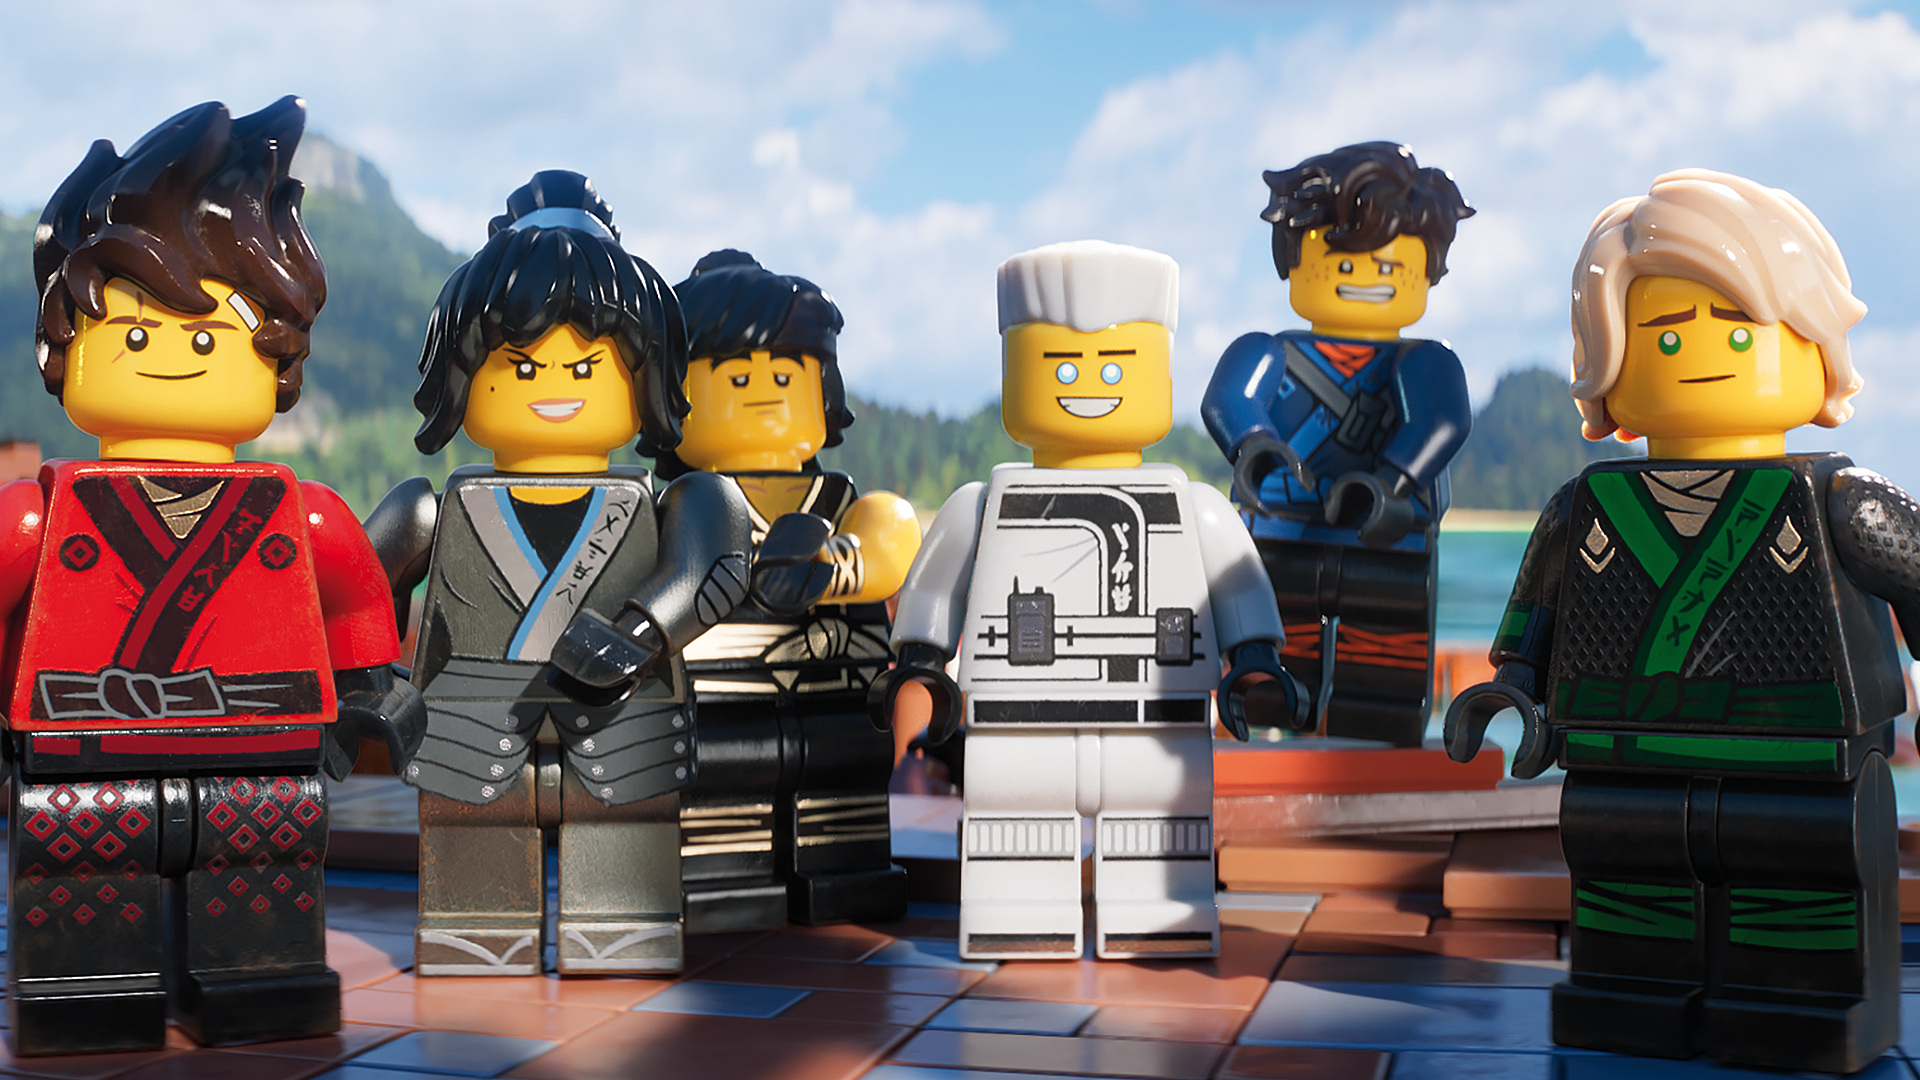 Lego Ninjago Wallpaper Hd Labzada